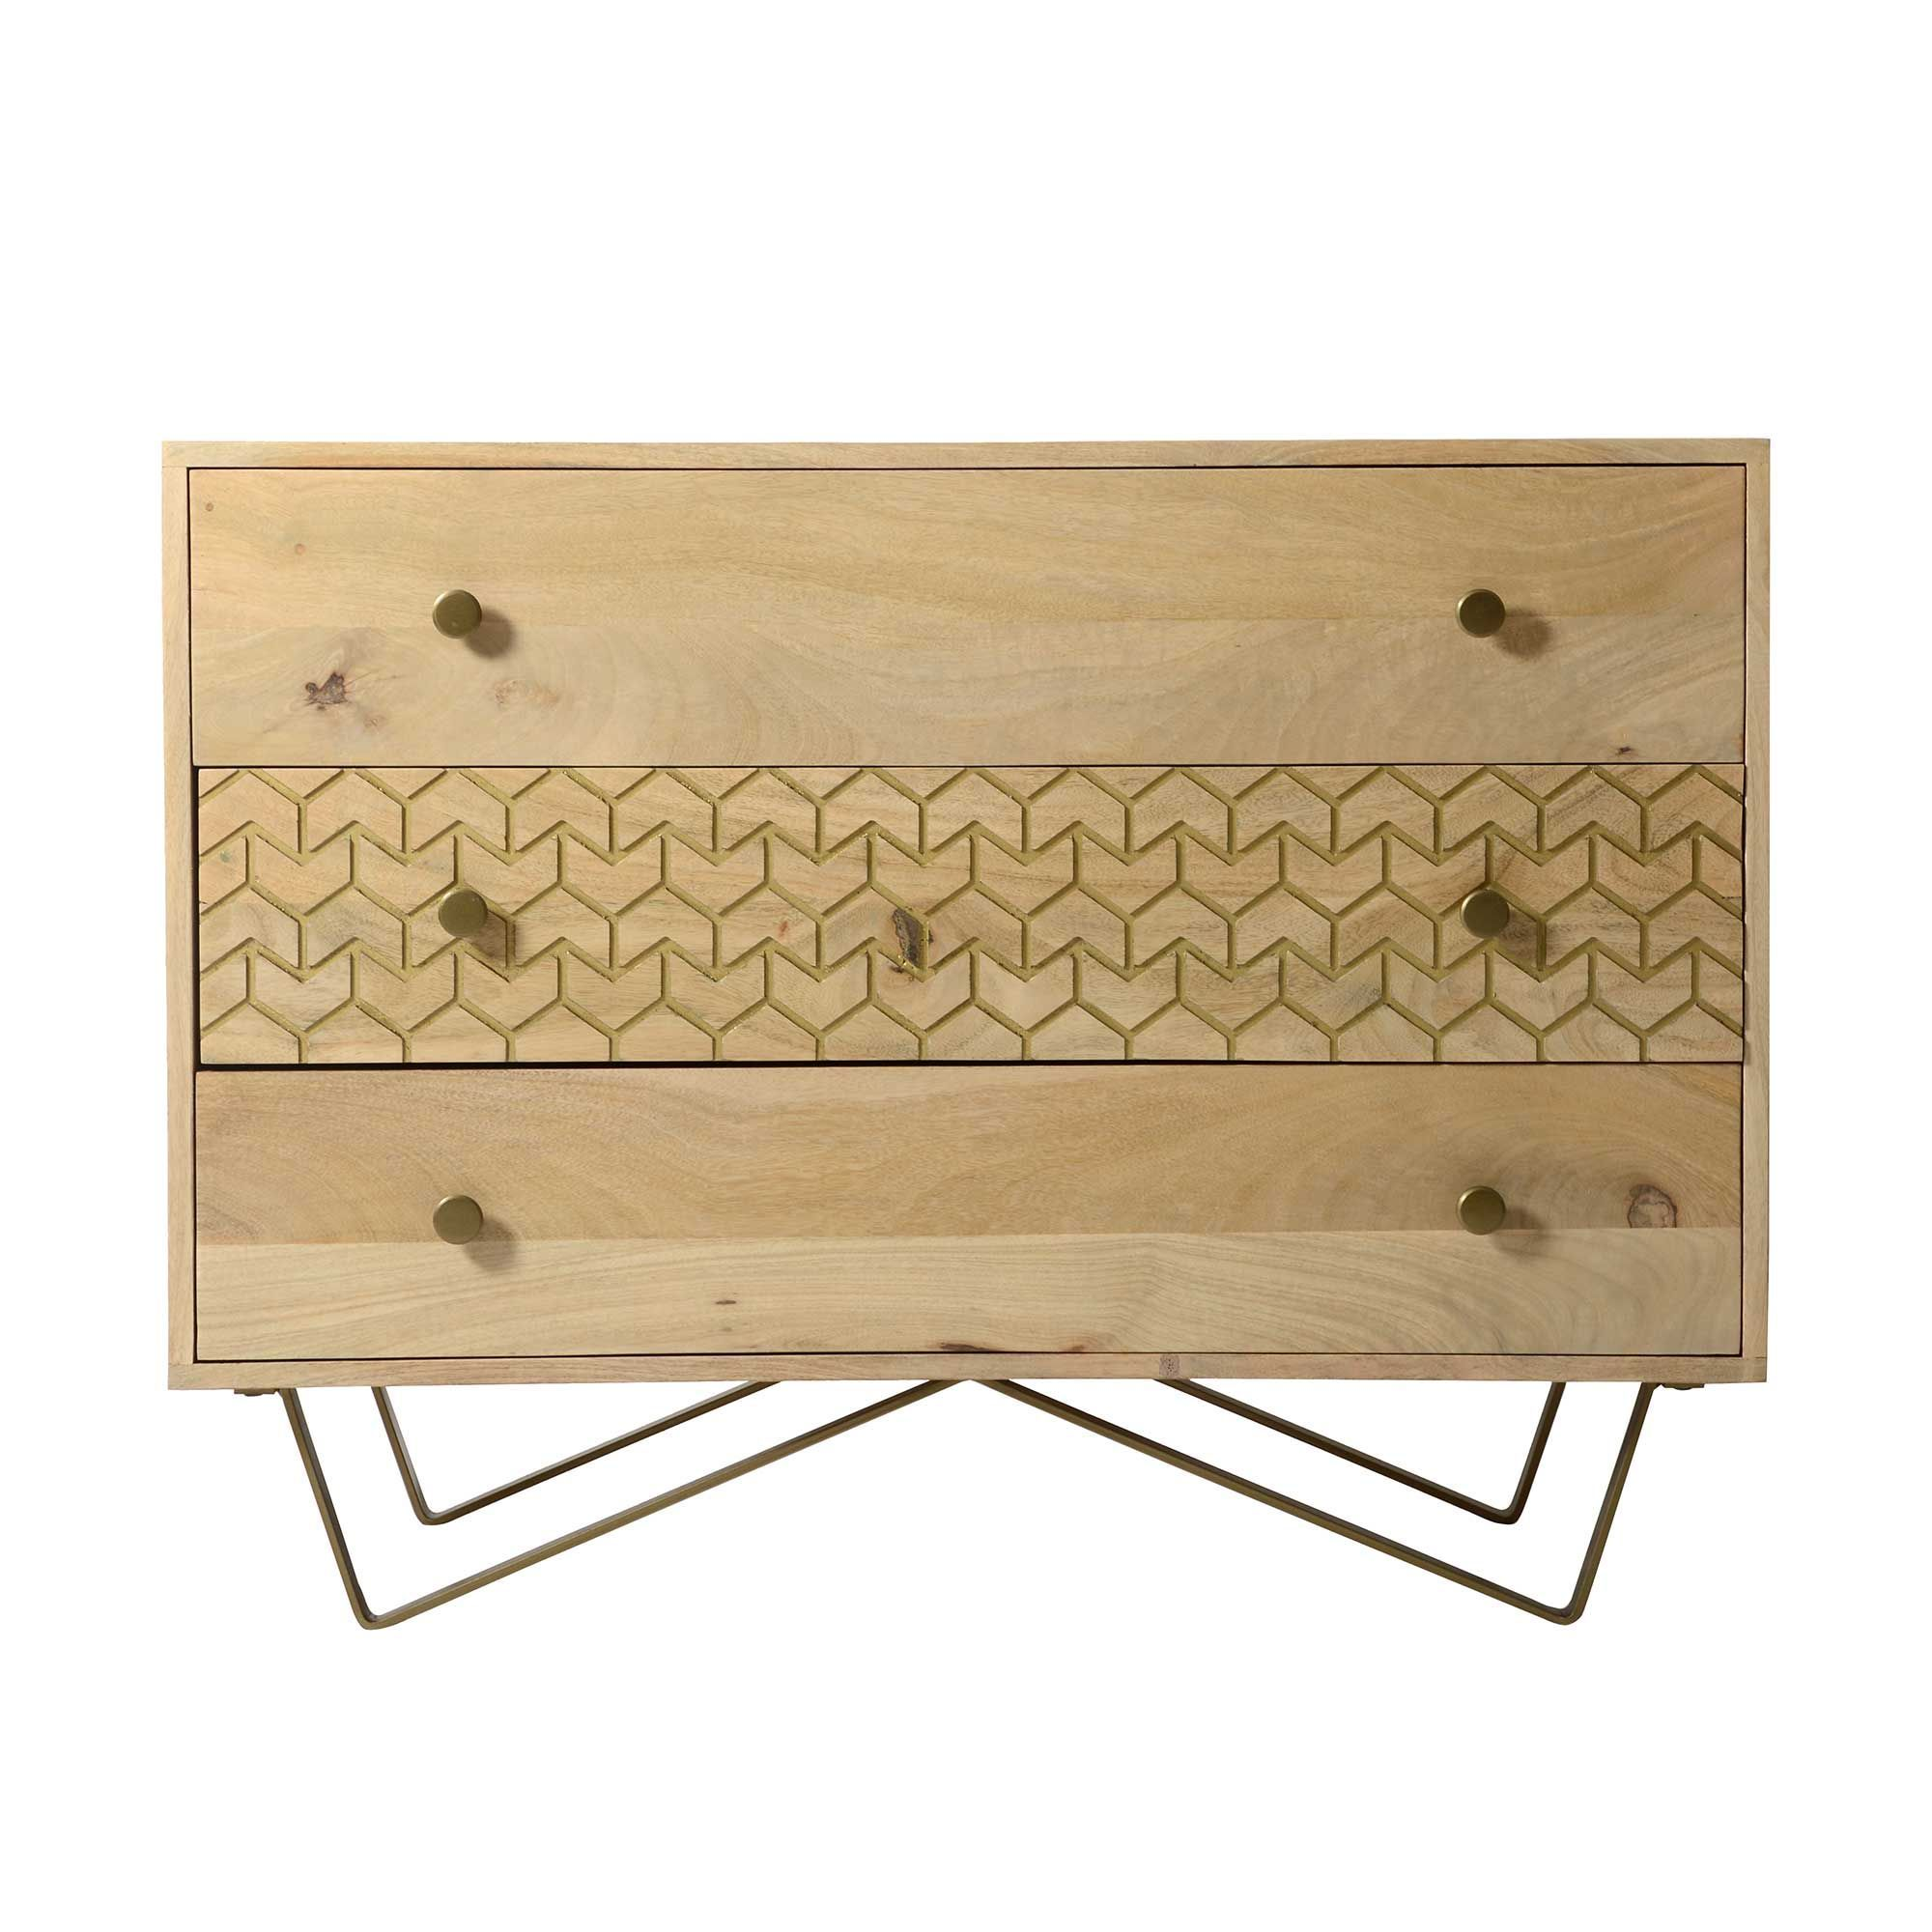 Bedroom Storage Chest Drupe 3 Drawer Chest Mango Wood And Brass Chests Storage Bedroom Bedroom Storage 3 Drawer Chest Wood